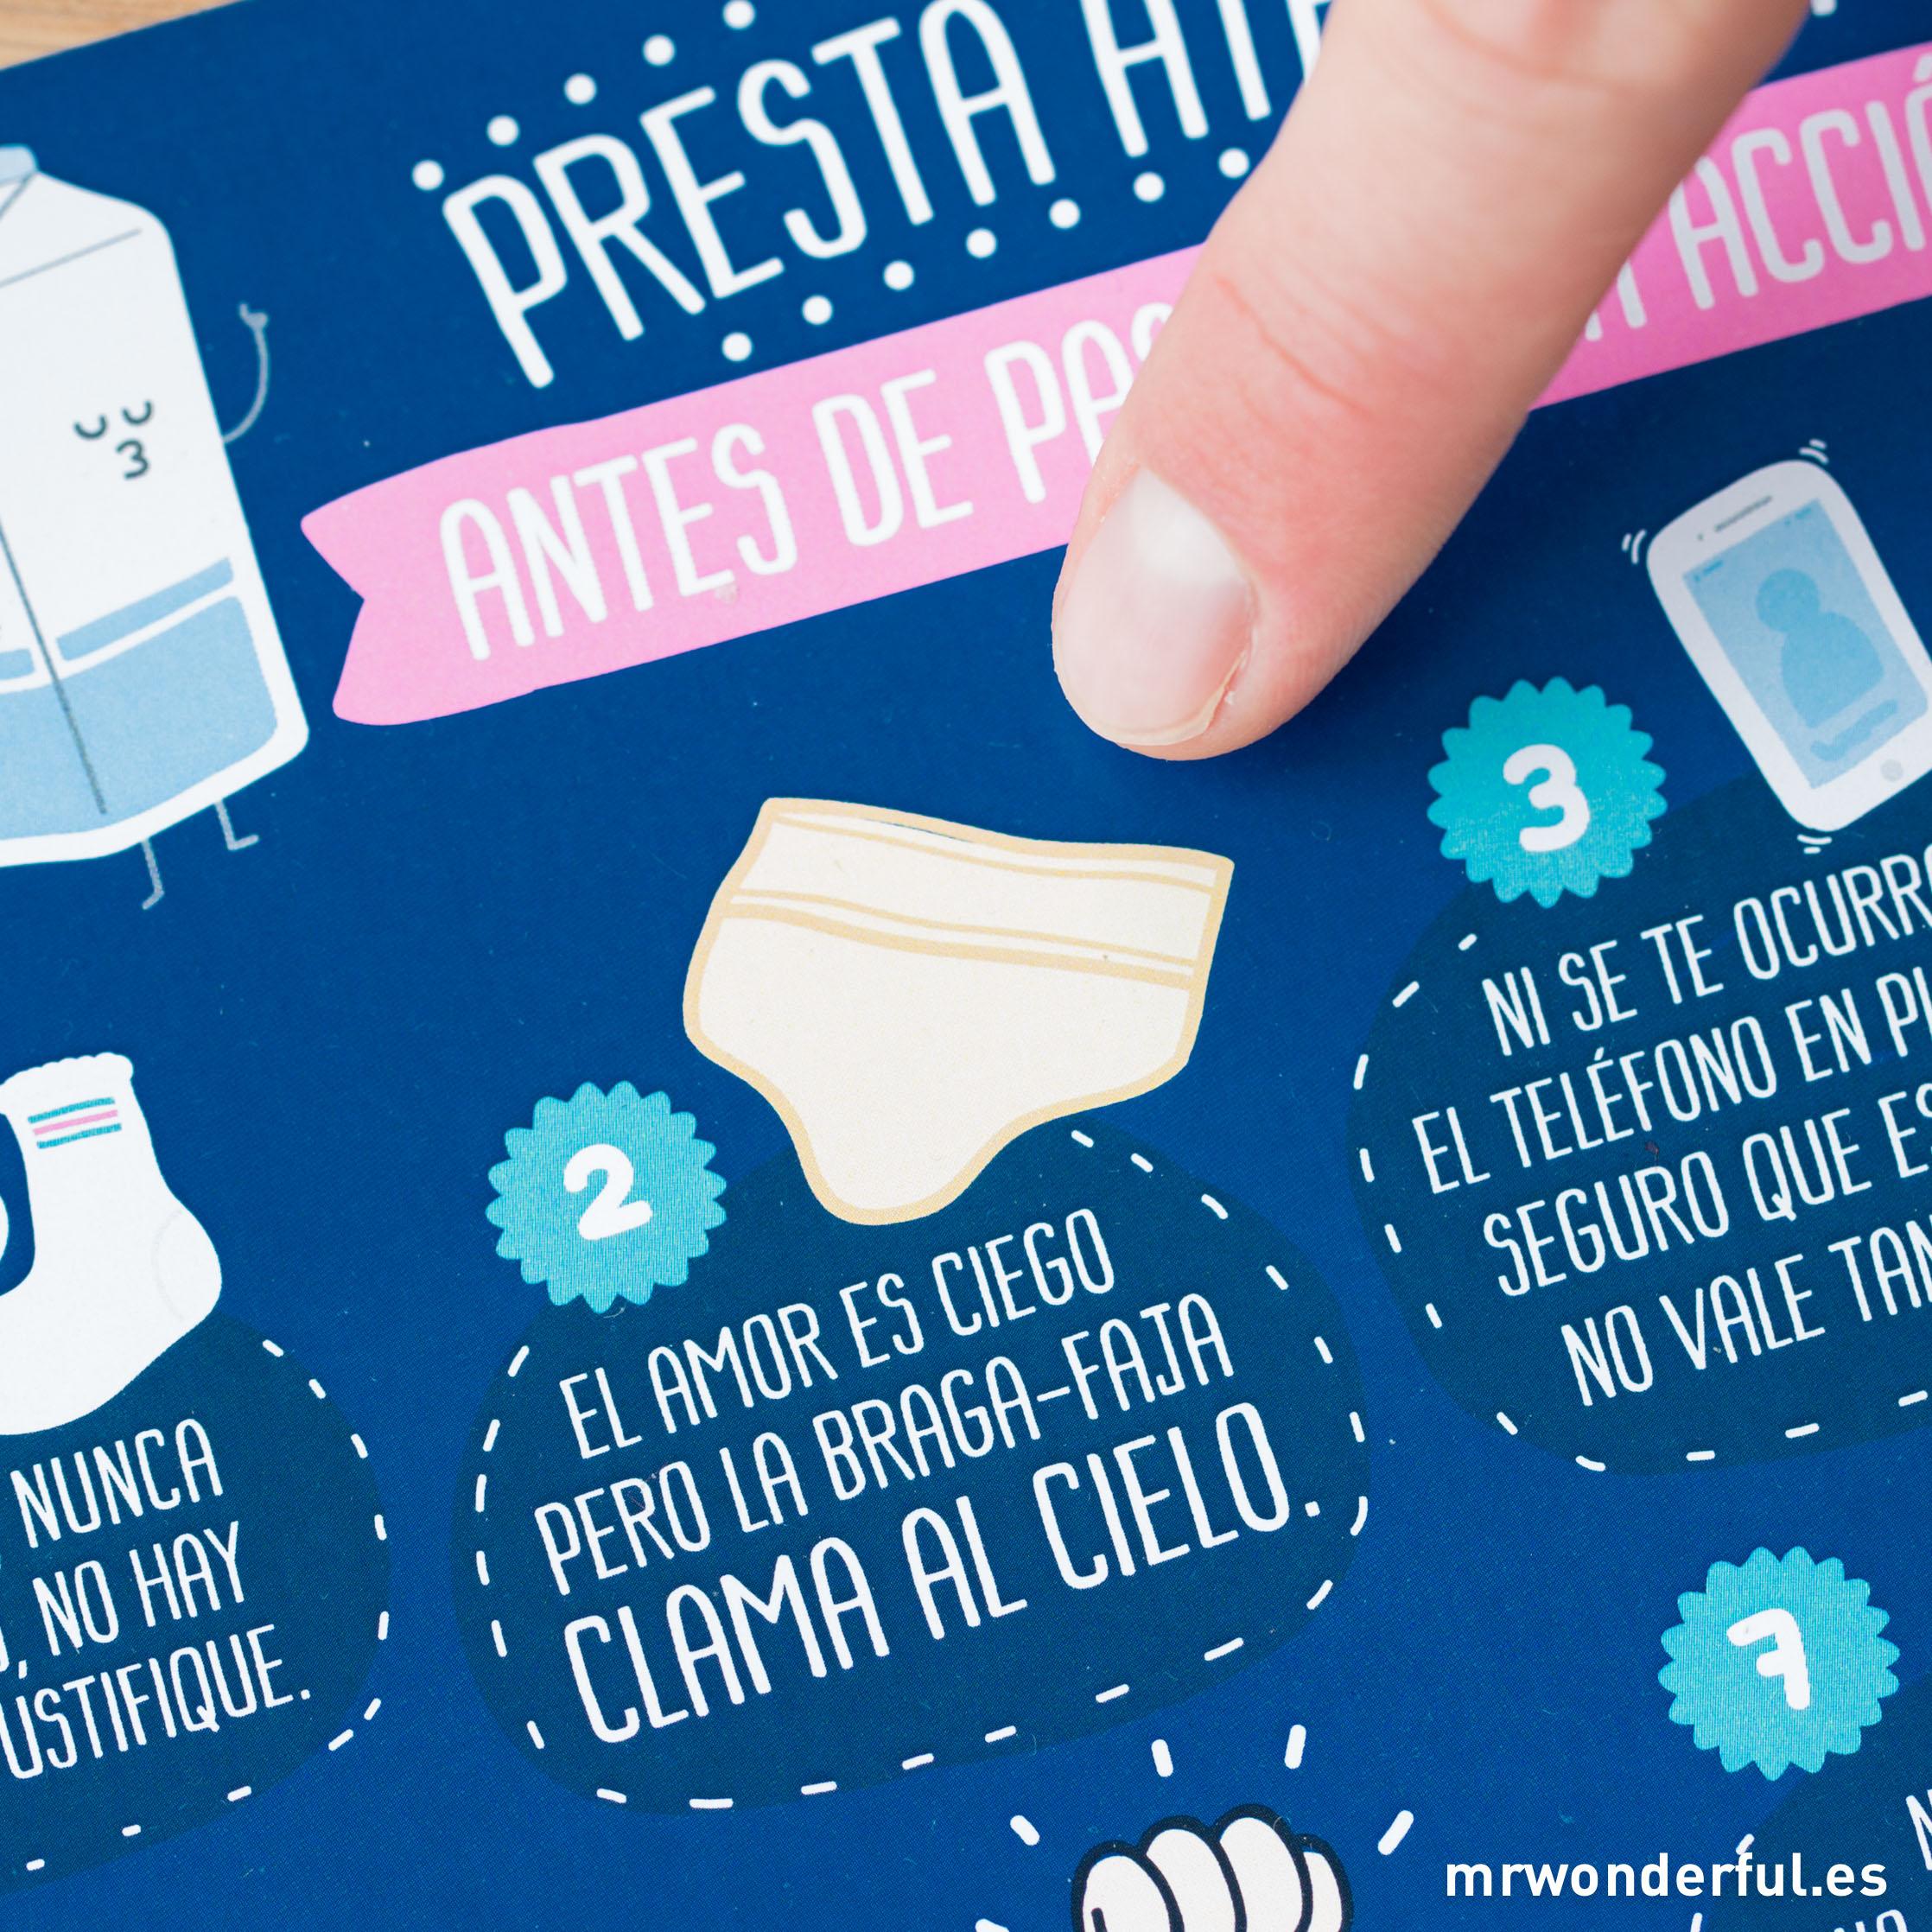 mrwonderful_control-muy-molon-preservativos-79